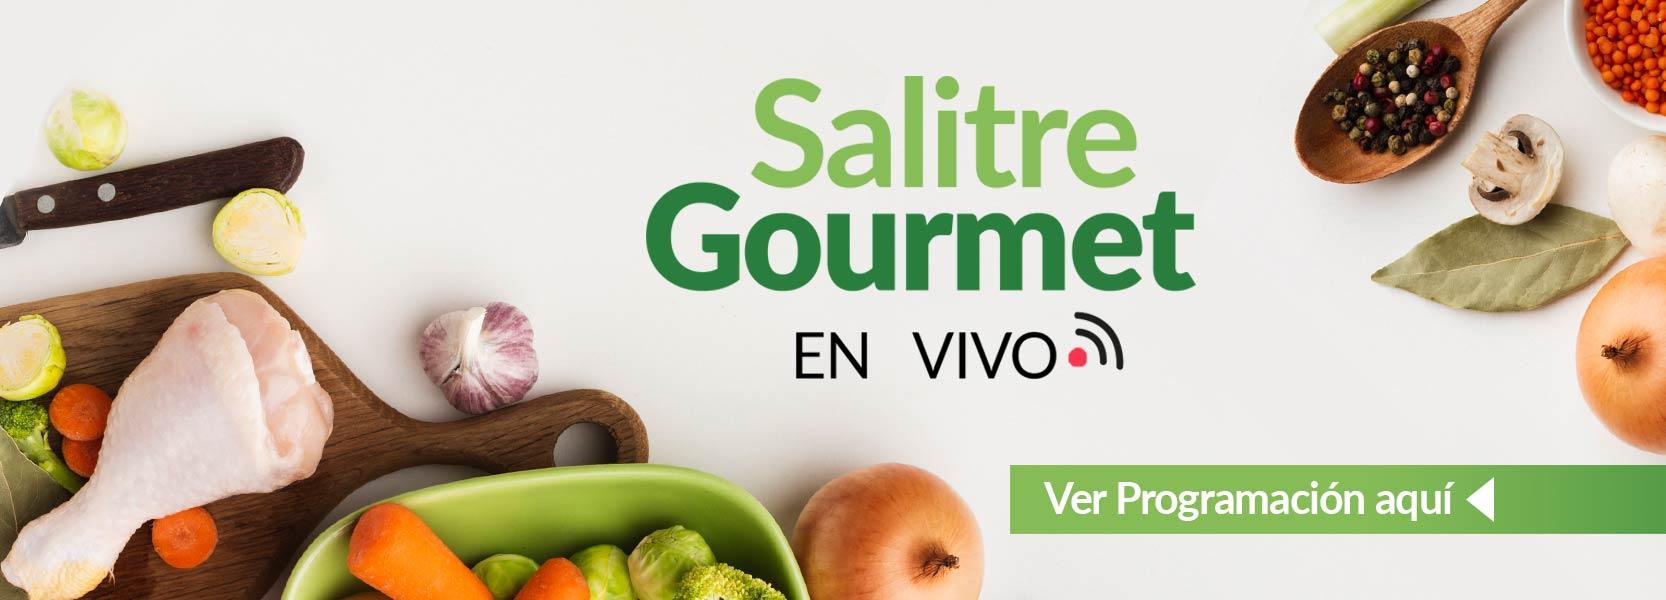 Salitre-Gourmet-WEB